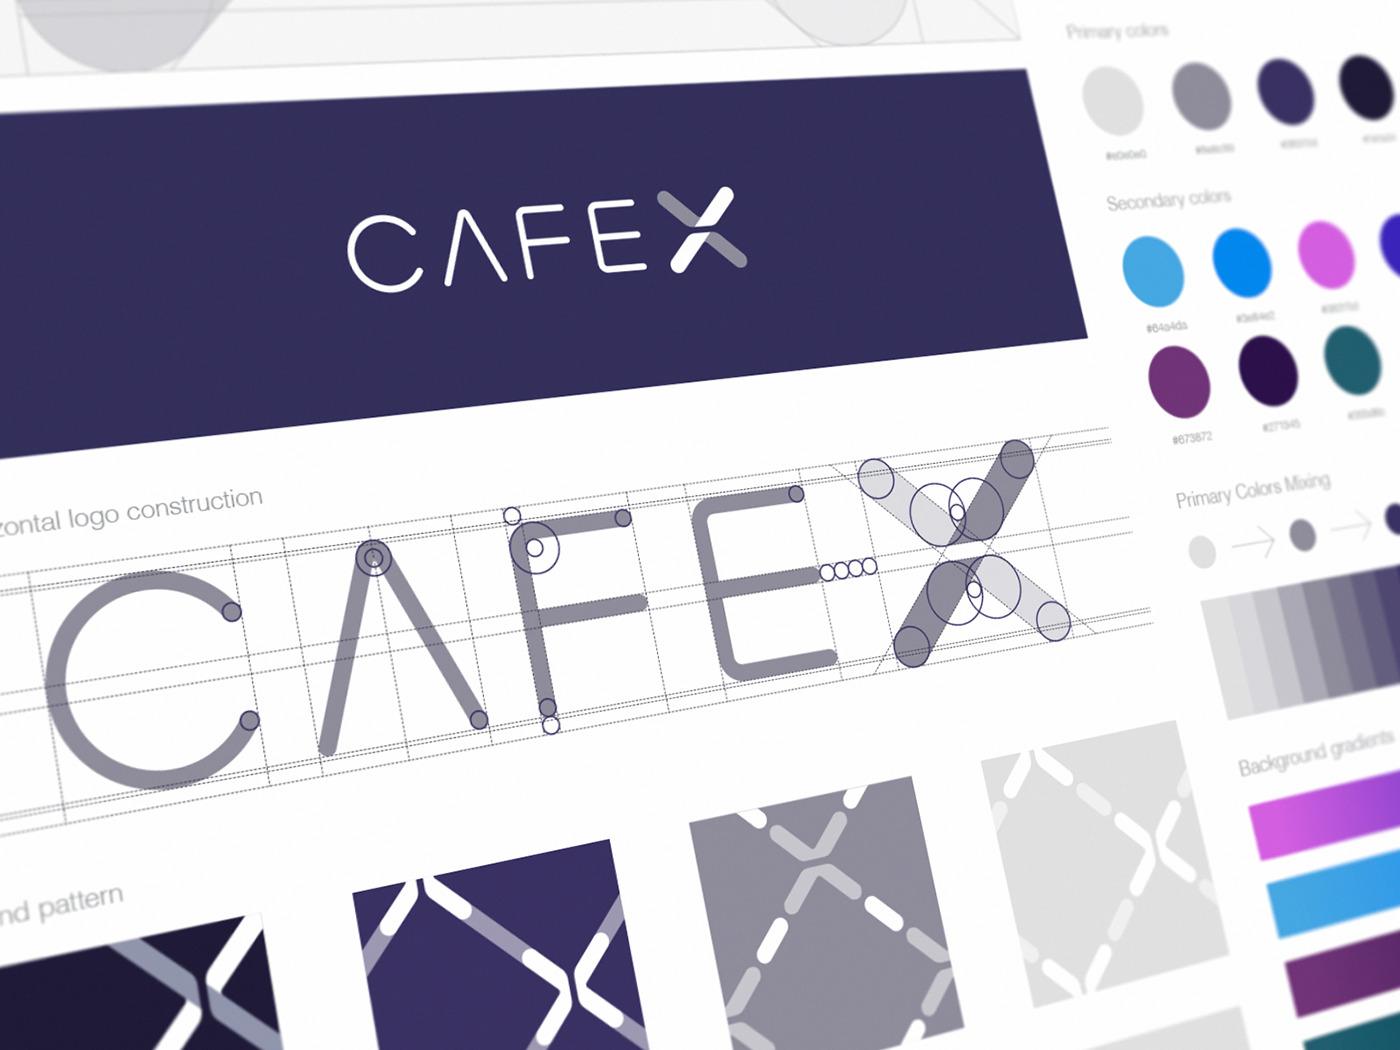 cafe x logo grid